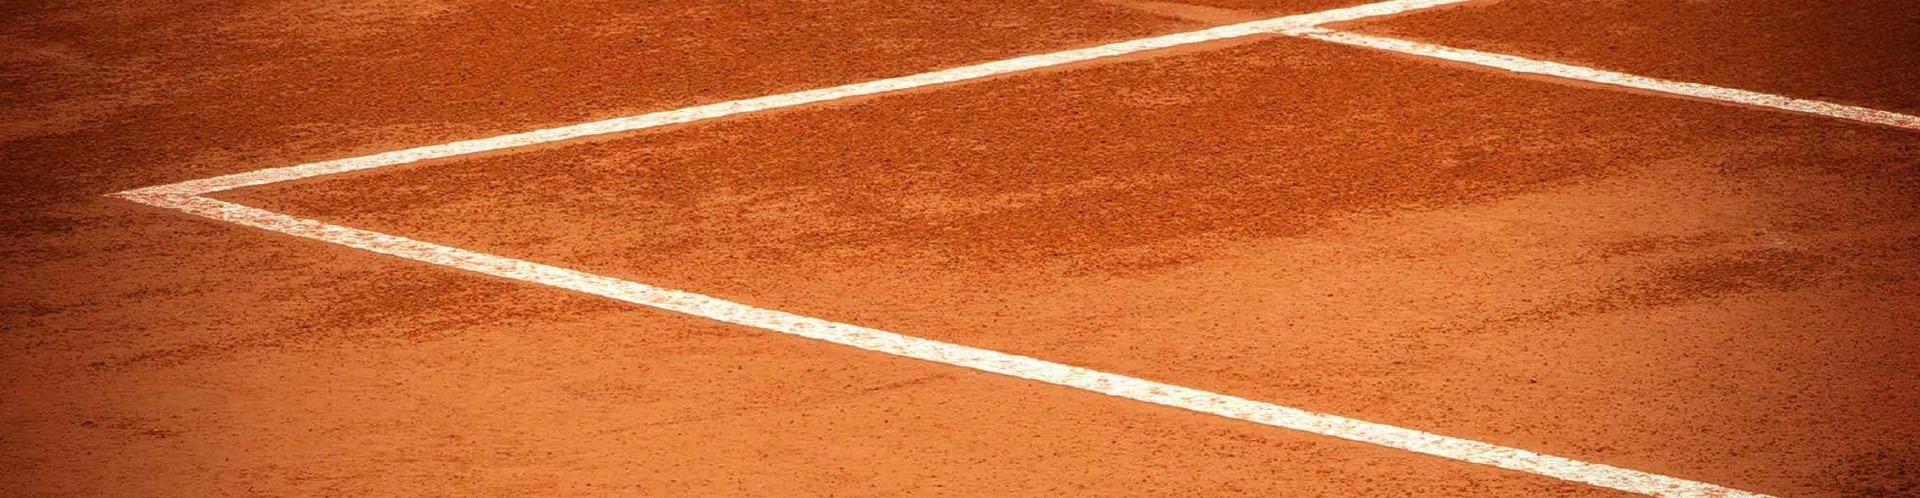 lokrovec-tenis